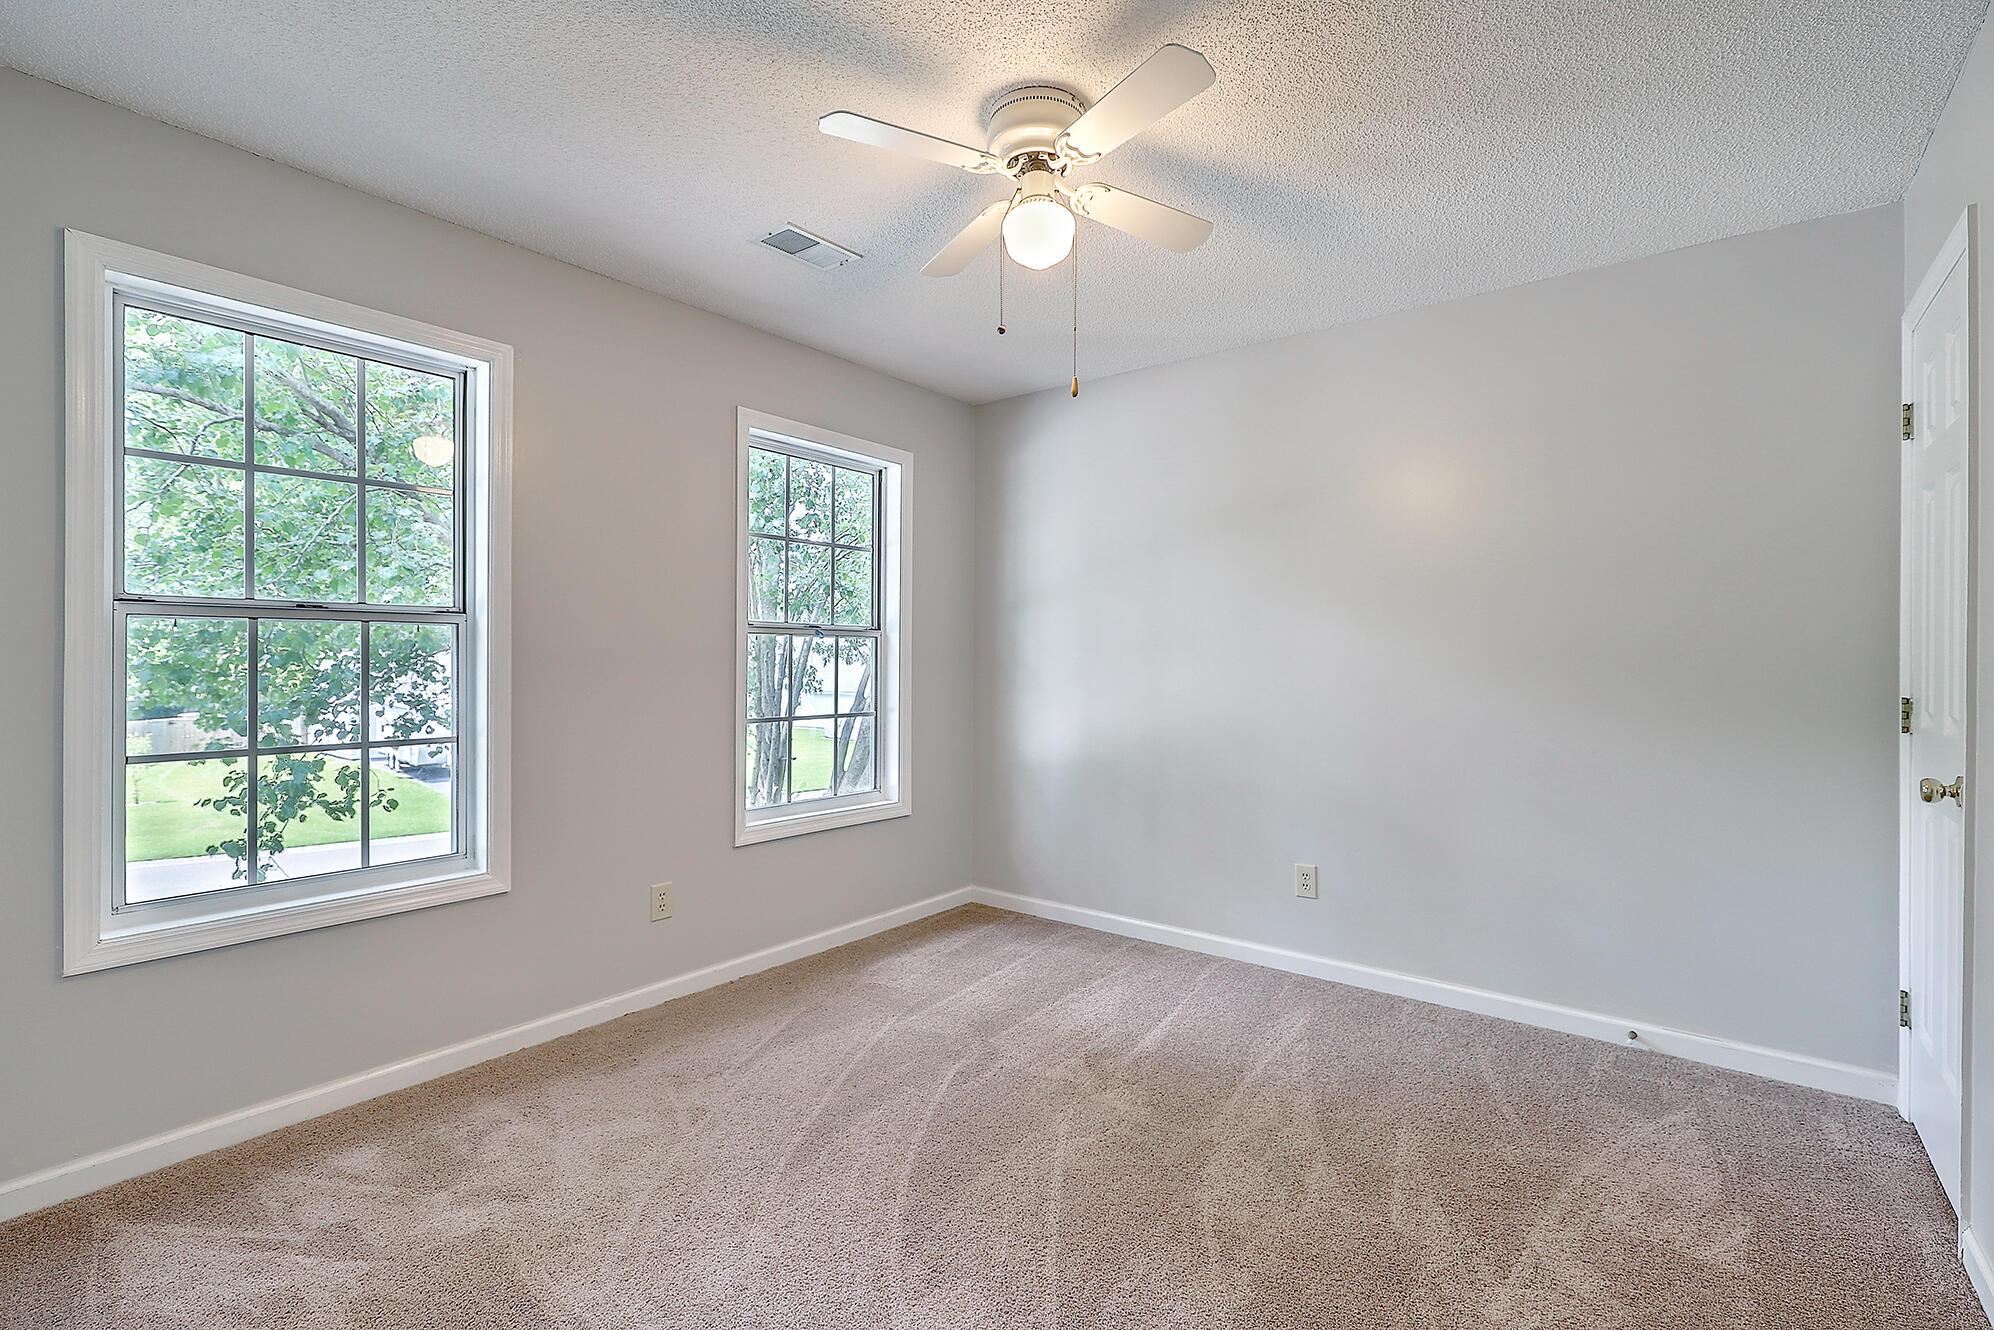 Appian Landing Homes For Sale - 8262 Longridge, North Charleston, SC - 39